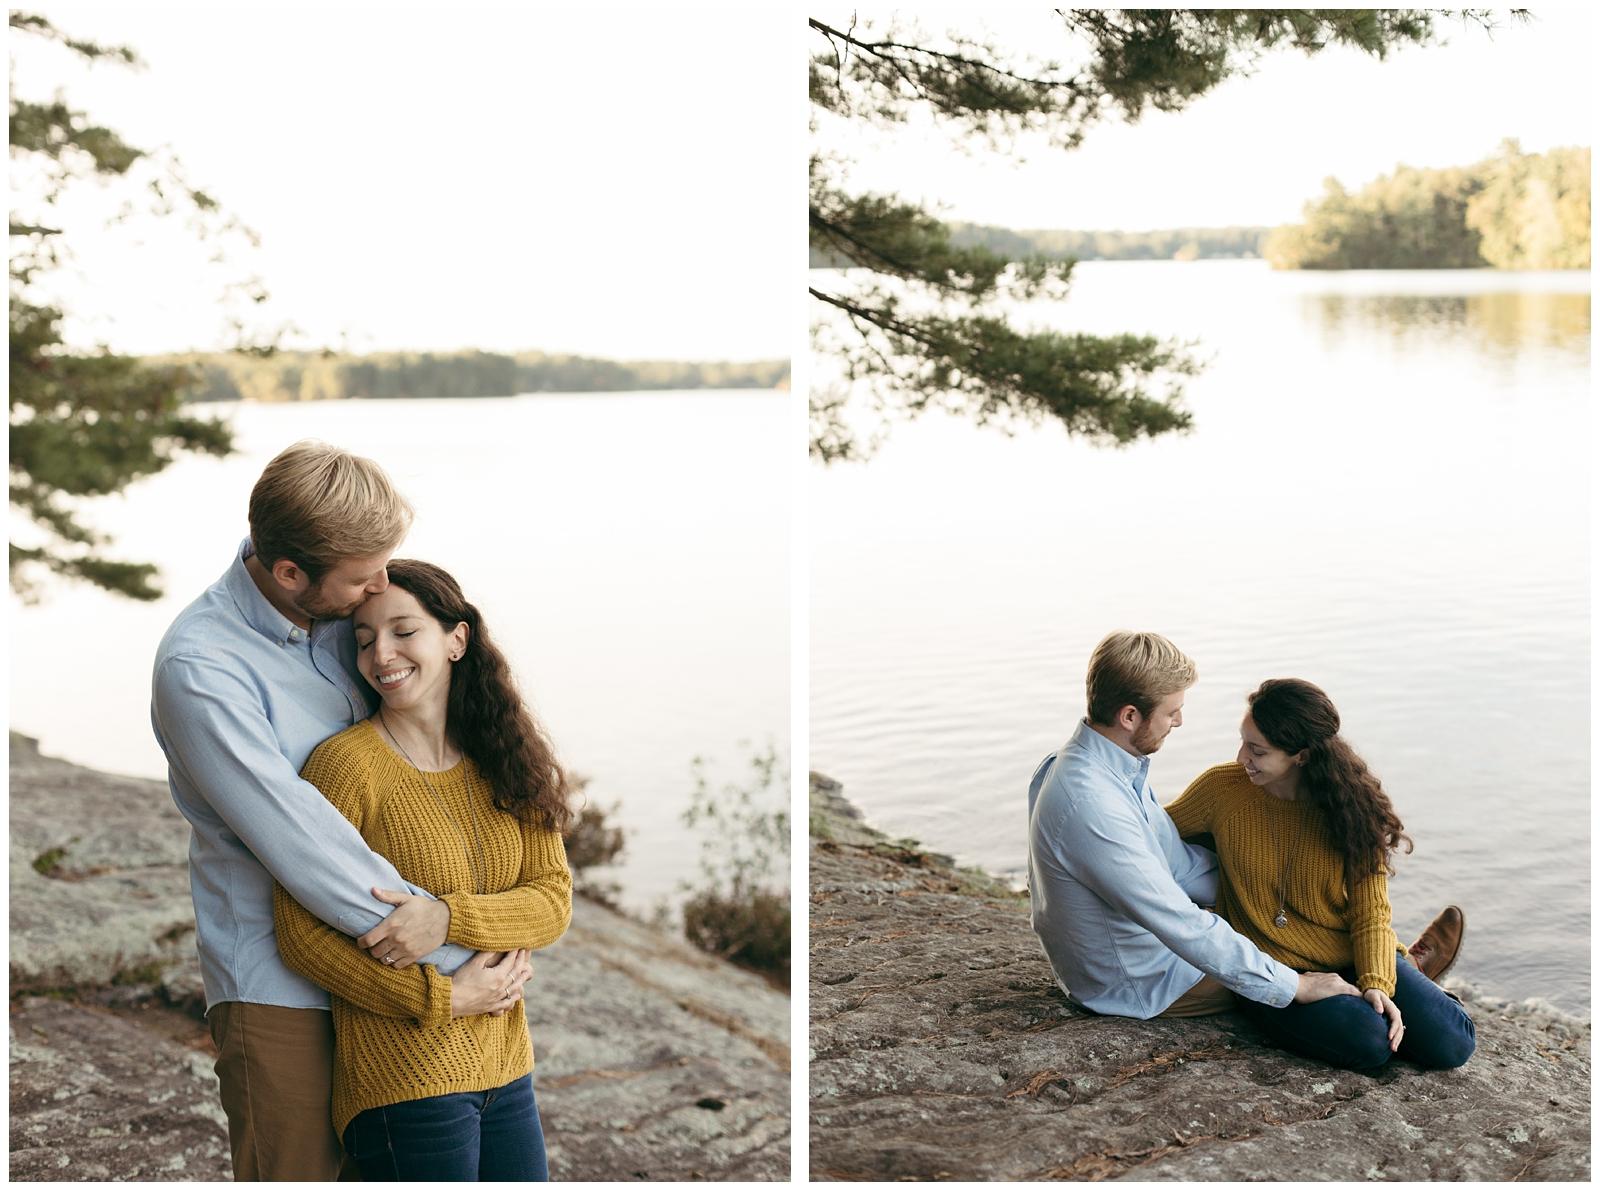 Connecticut-Engagement-Photographer-Bailey-Q-Photo-21.jpg